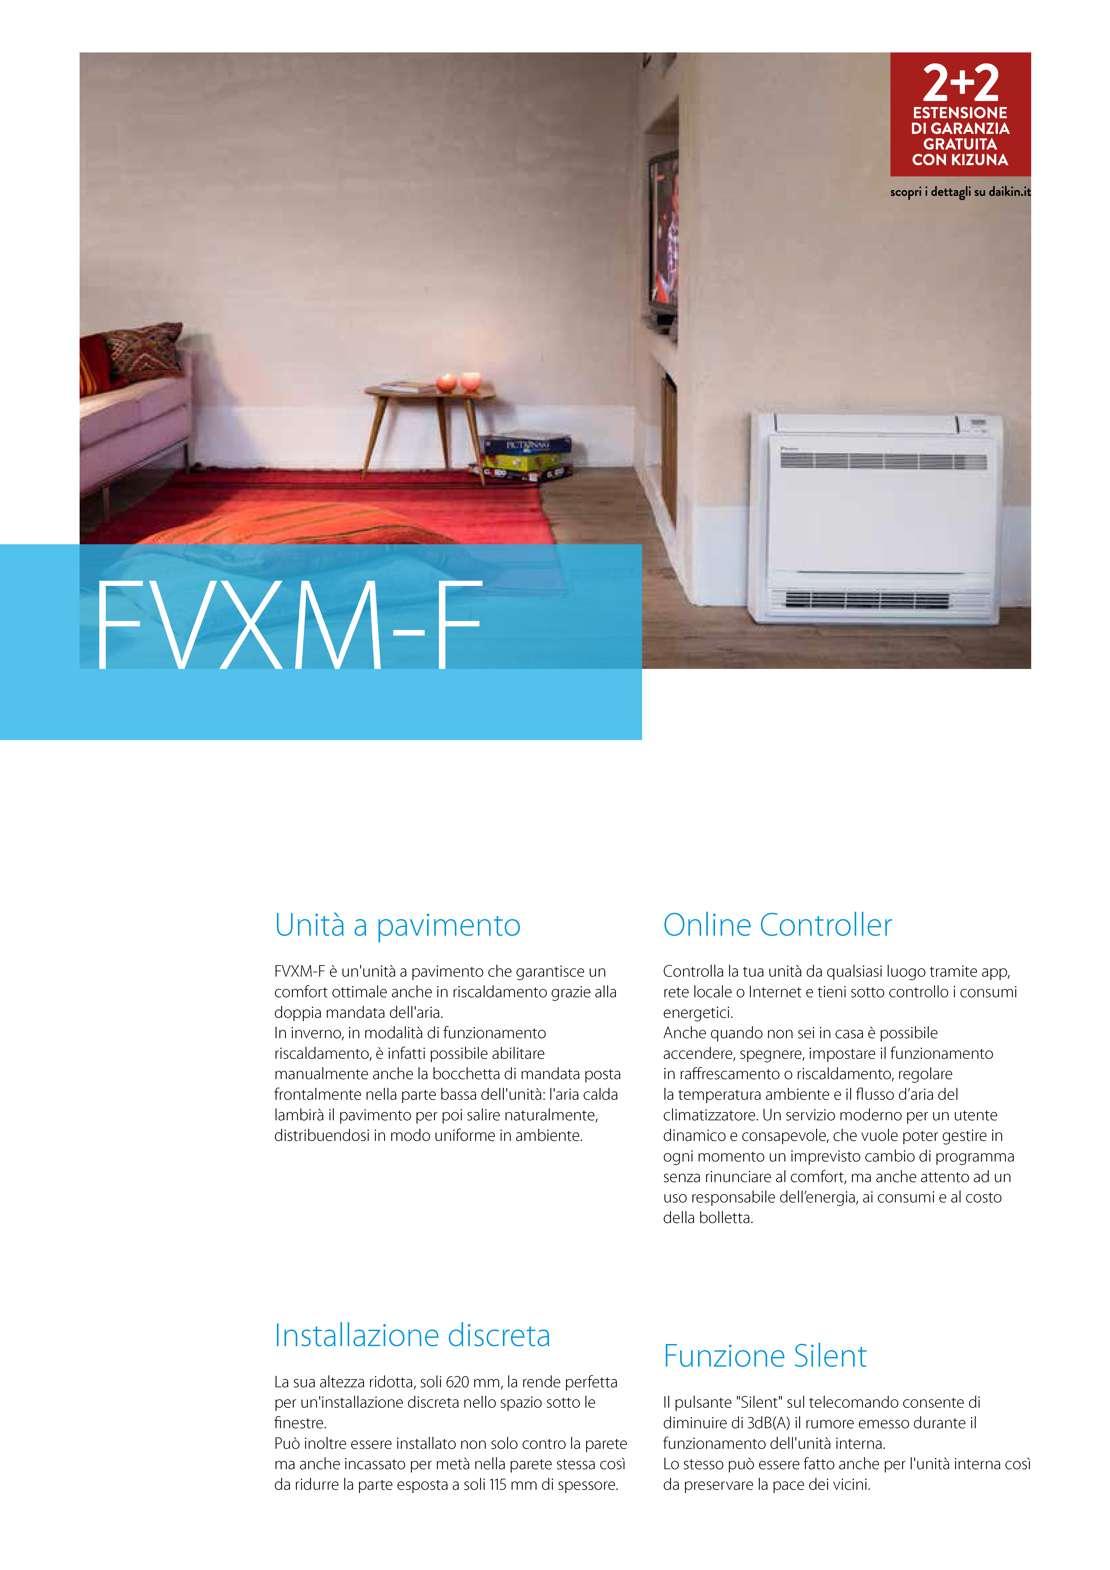 Daikin Climatizzatore fvxm-f